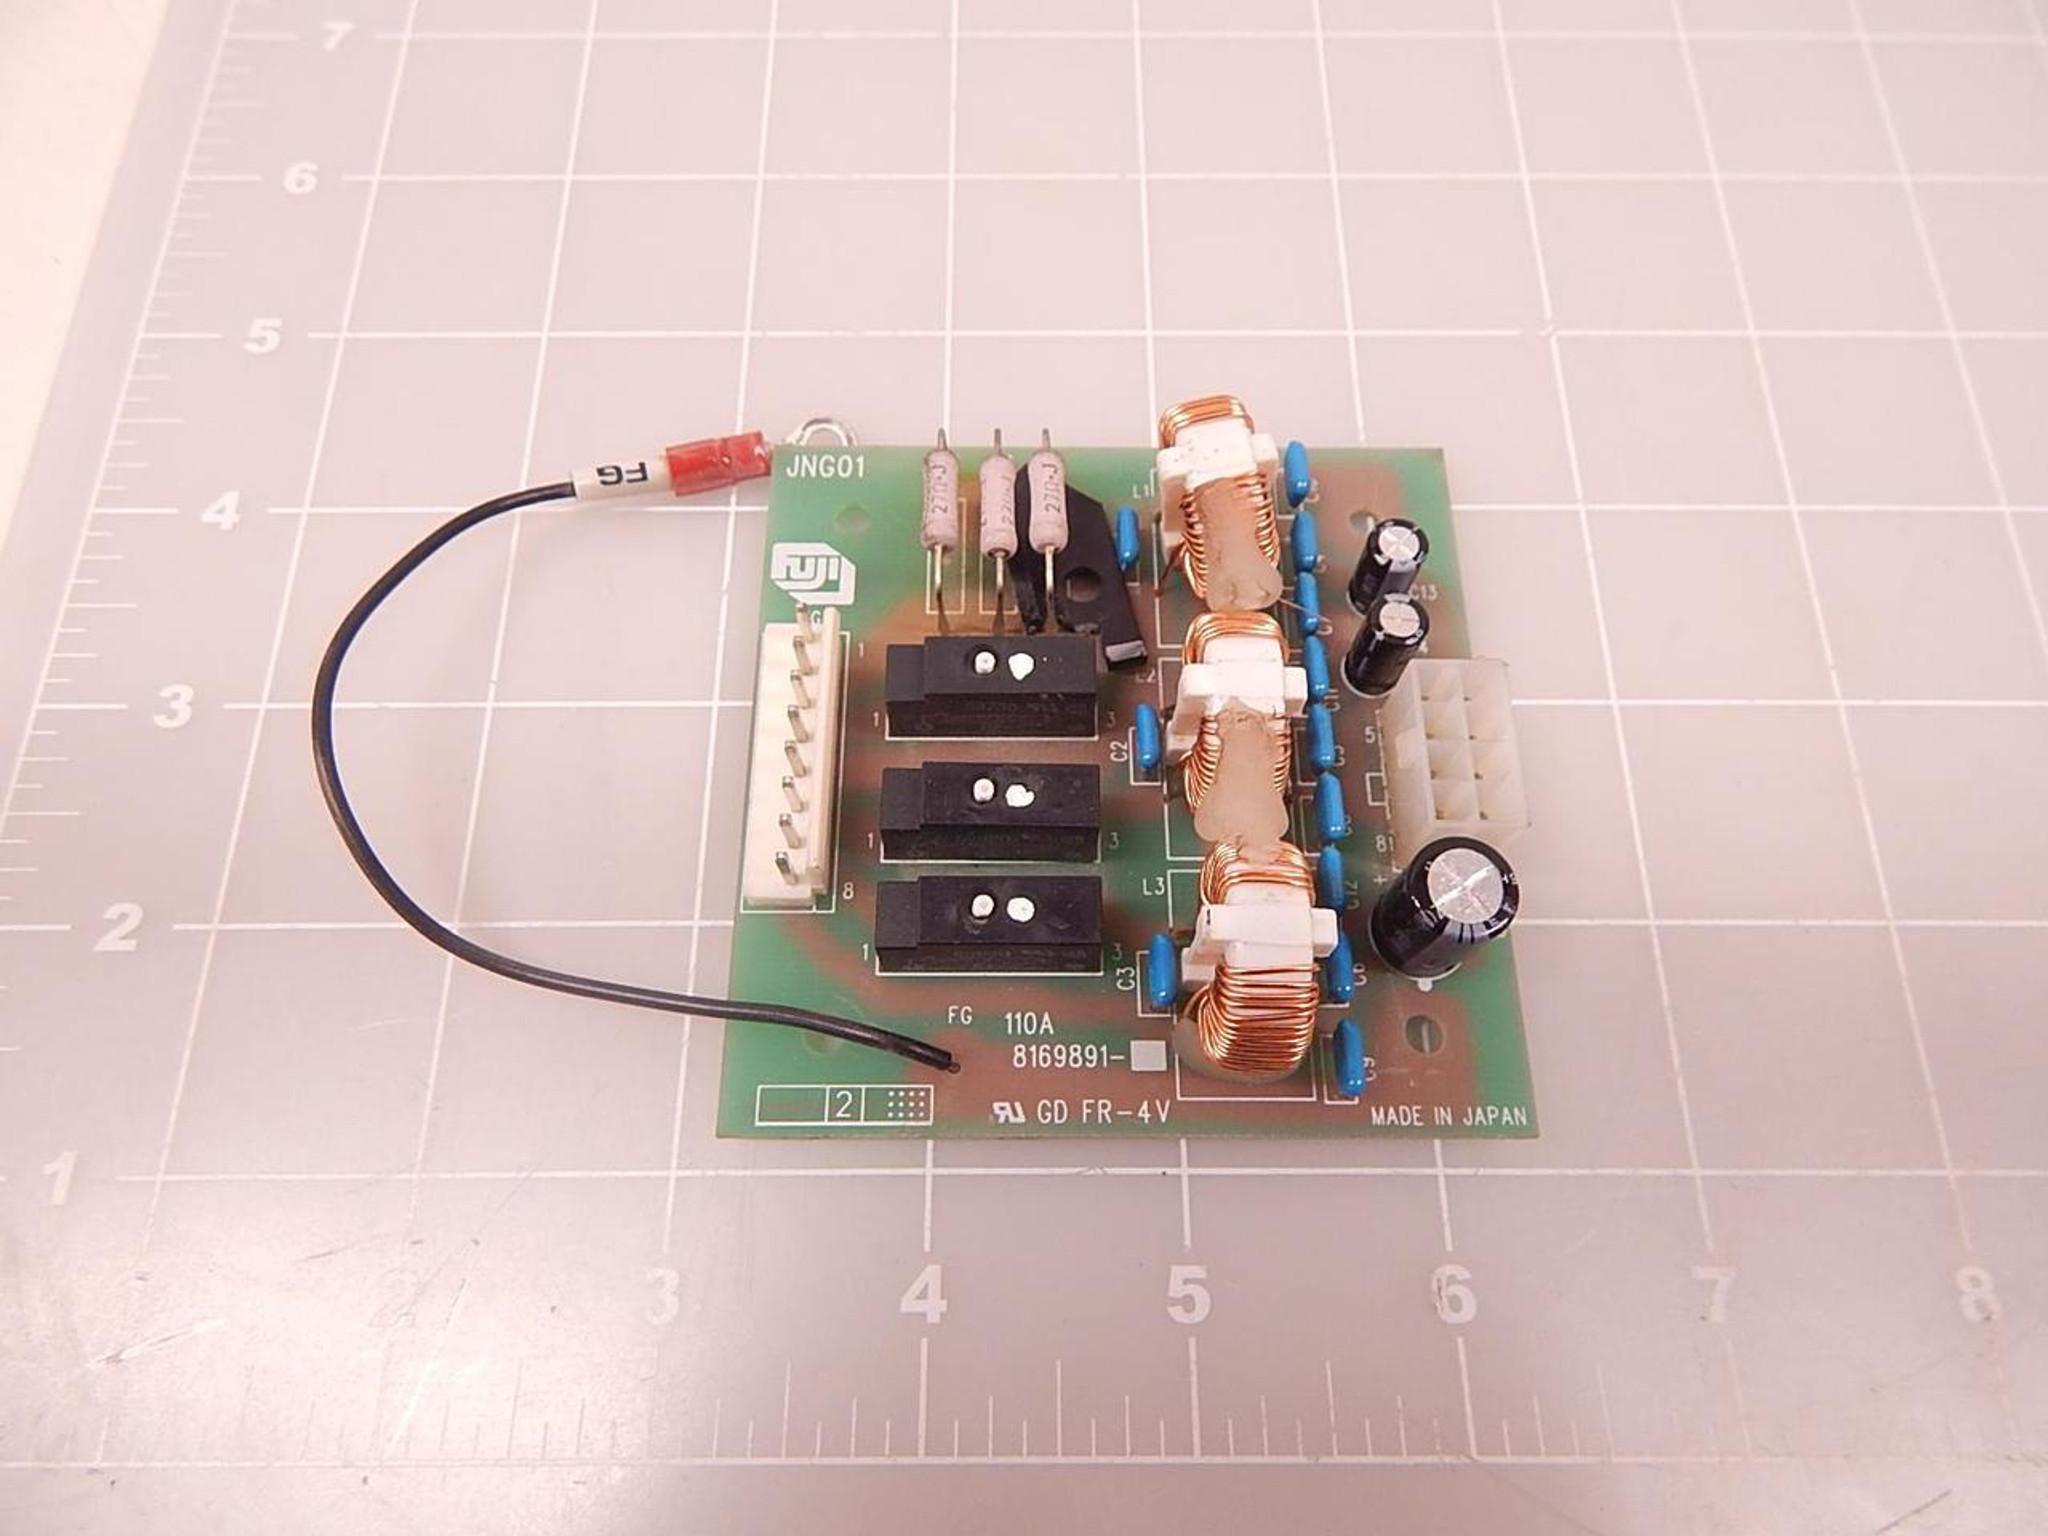 Fuji 110A8169891, JNG01, 110B8169881 Circuit Board T73213